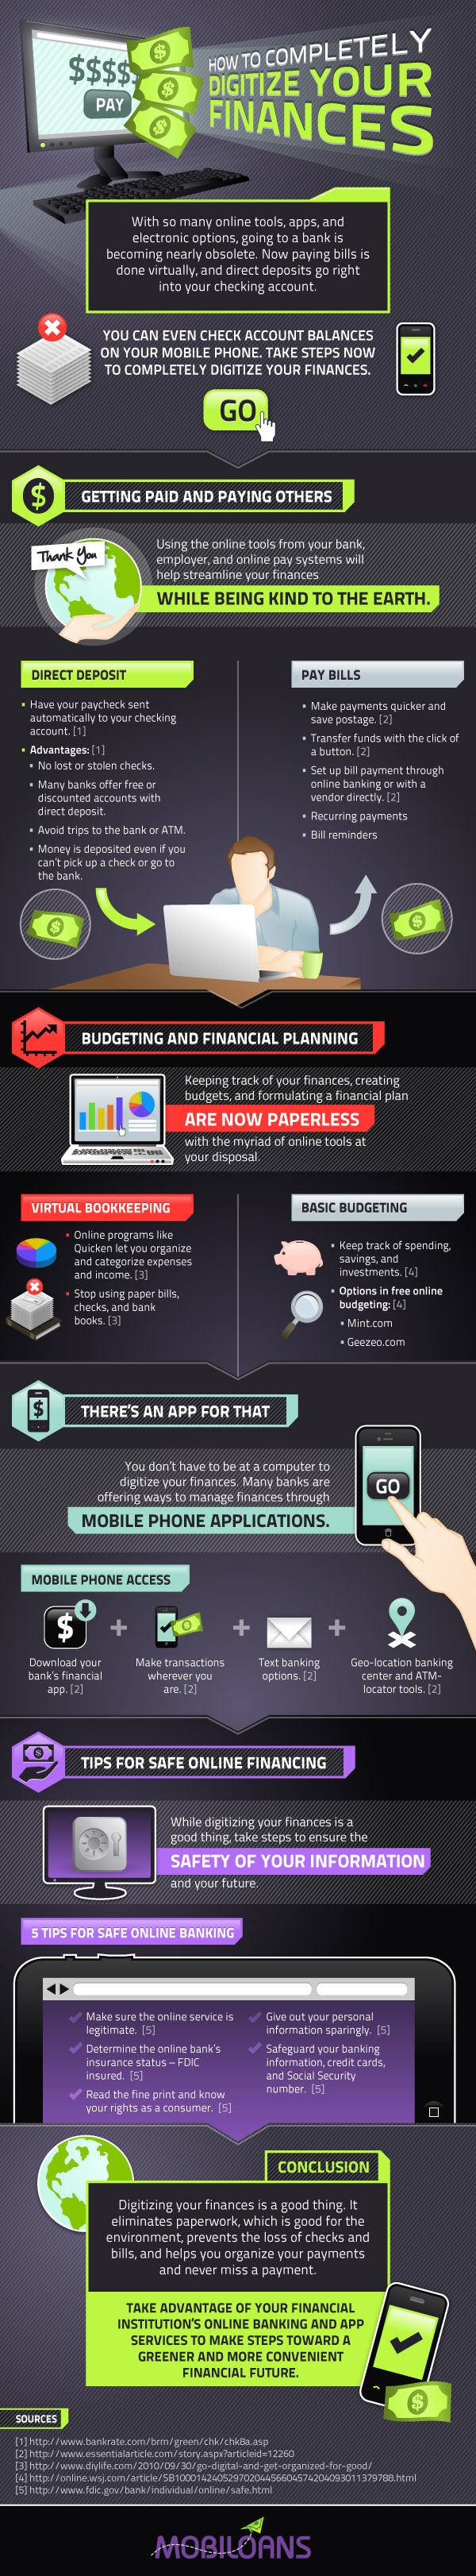 Digitize-Your-Finances-infographic